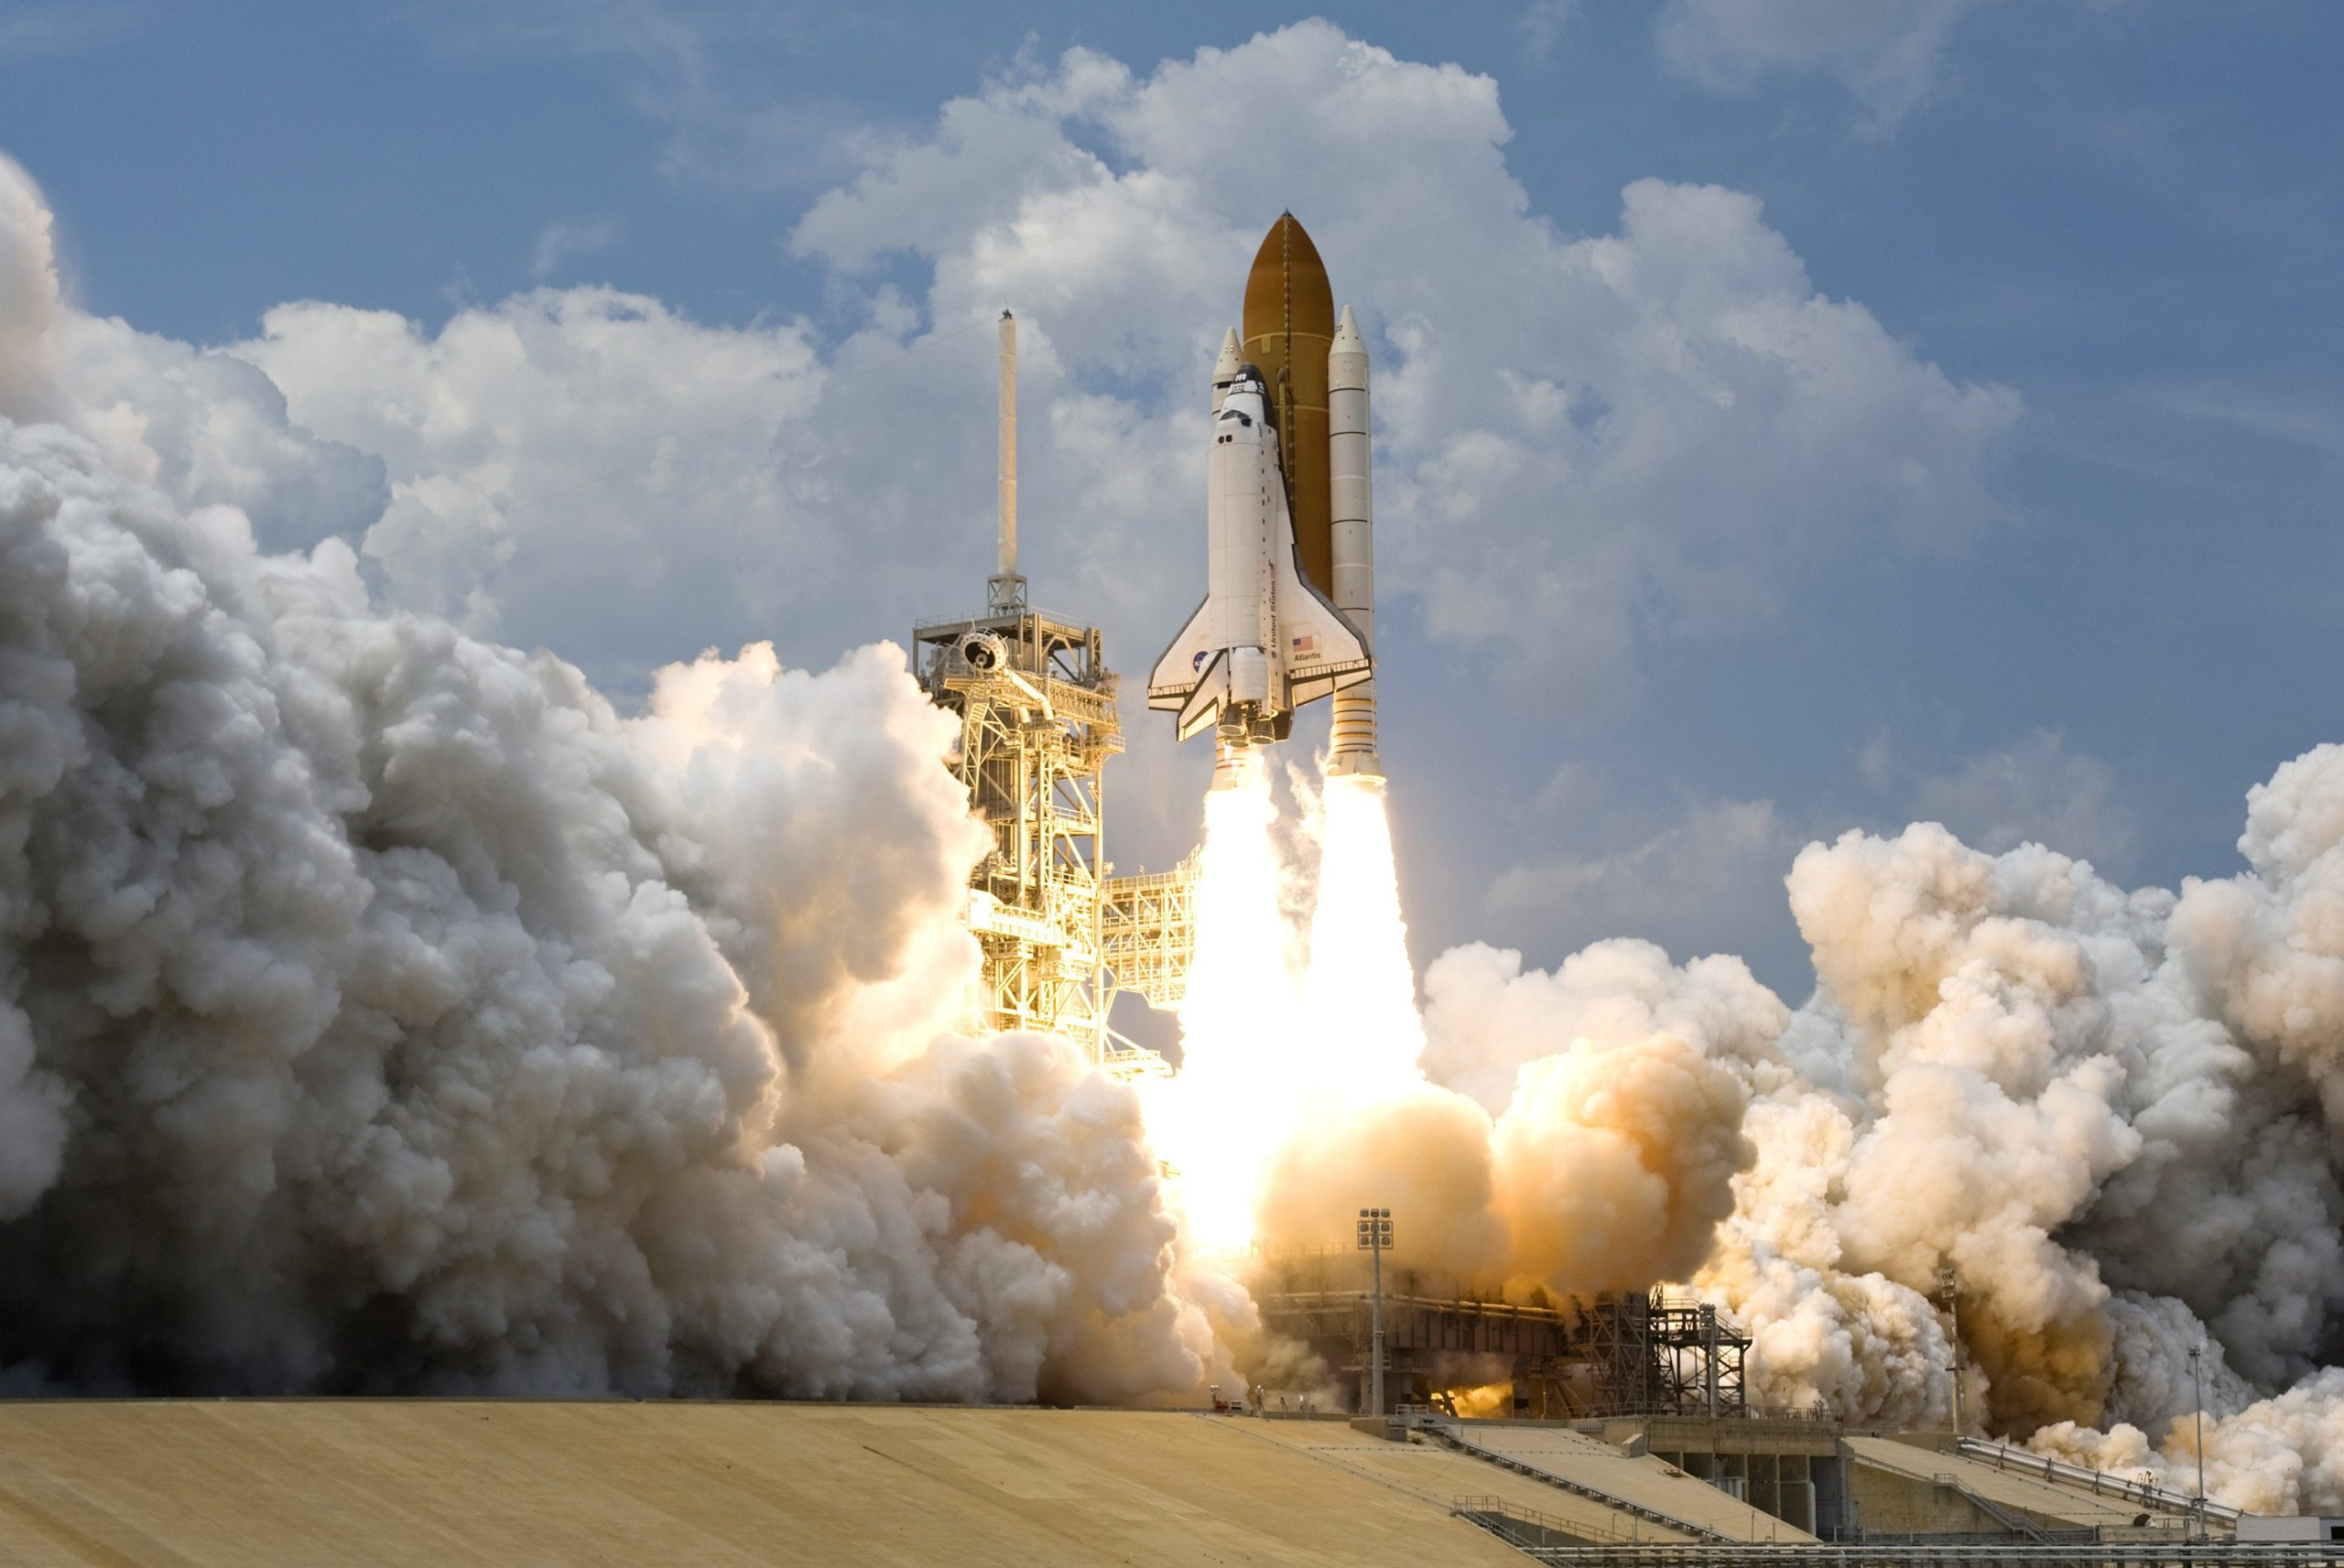 Enterprise Innovation Challenge: How Do You Accelerate Innovation?